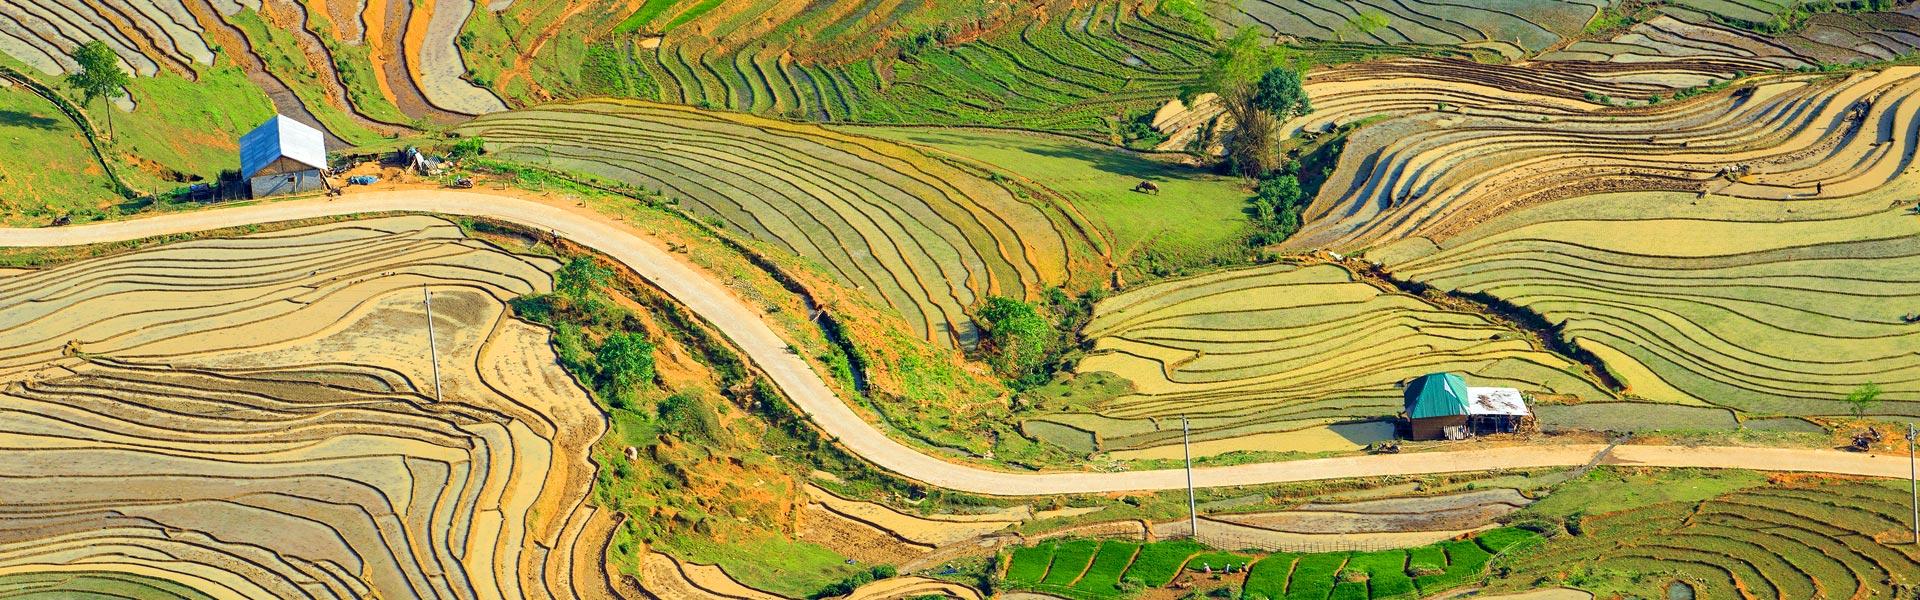 Exploring Hoang Su Phi in Vietnam | Wendy Wu Tours Blog